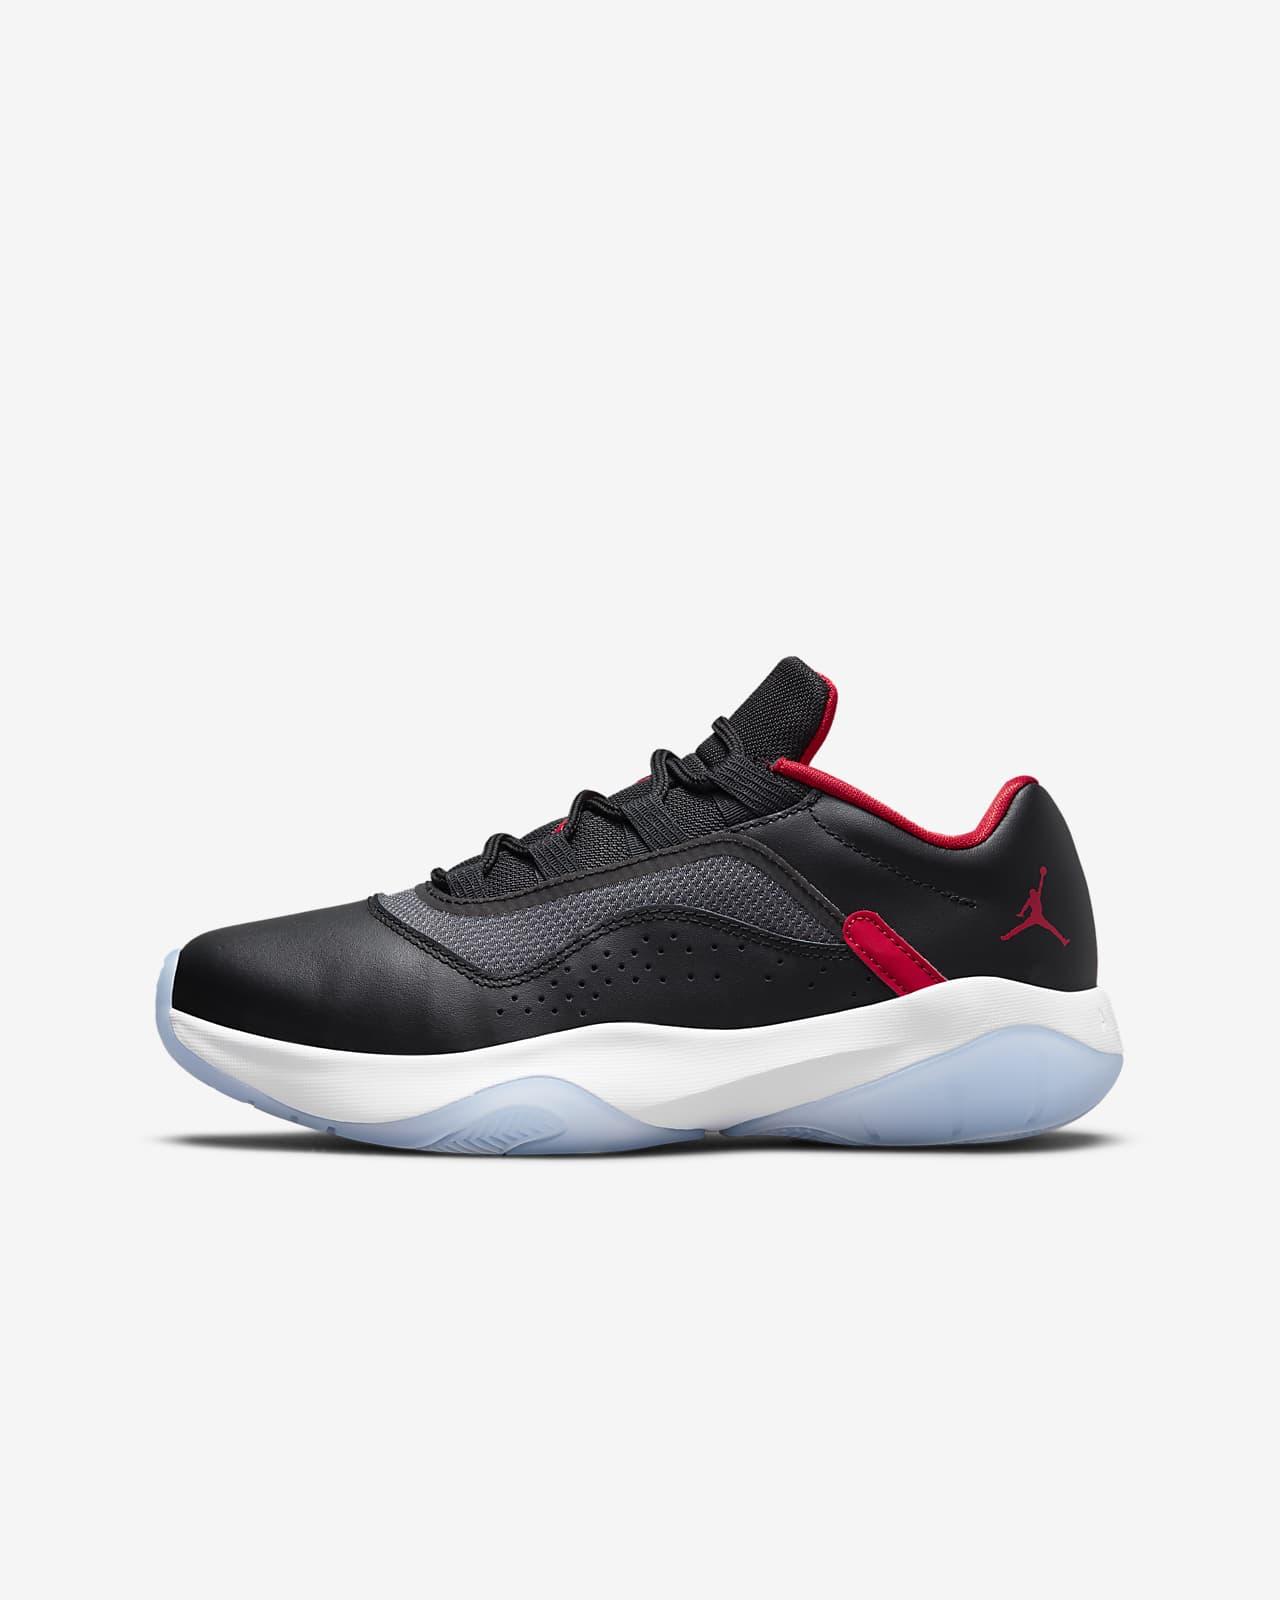 Air Jordan 11 CMFT Low (GS) 大童运动童鞋